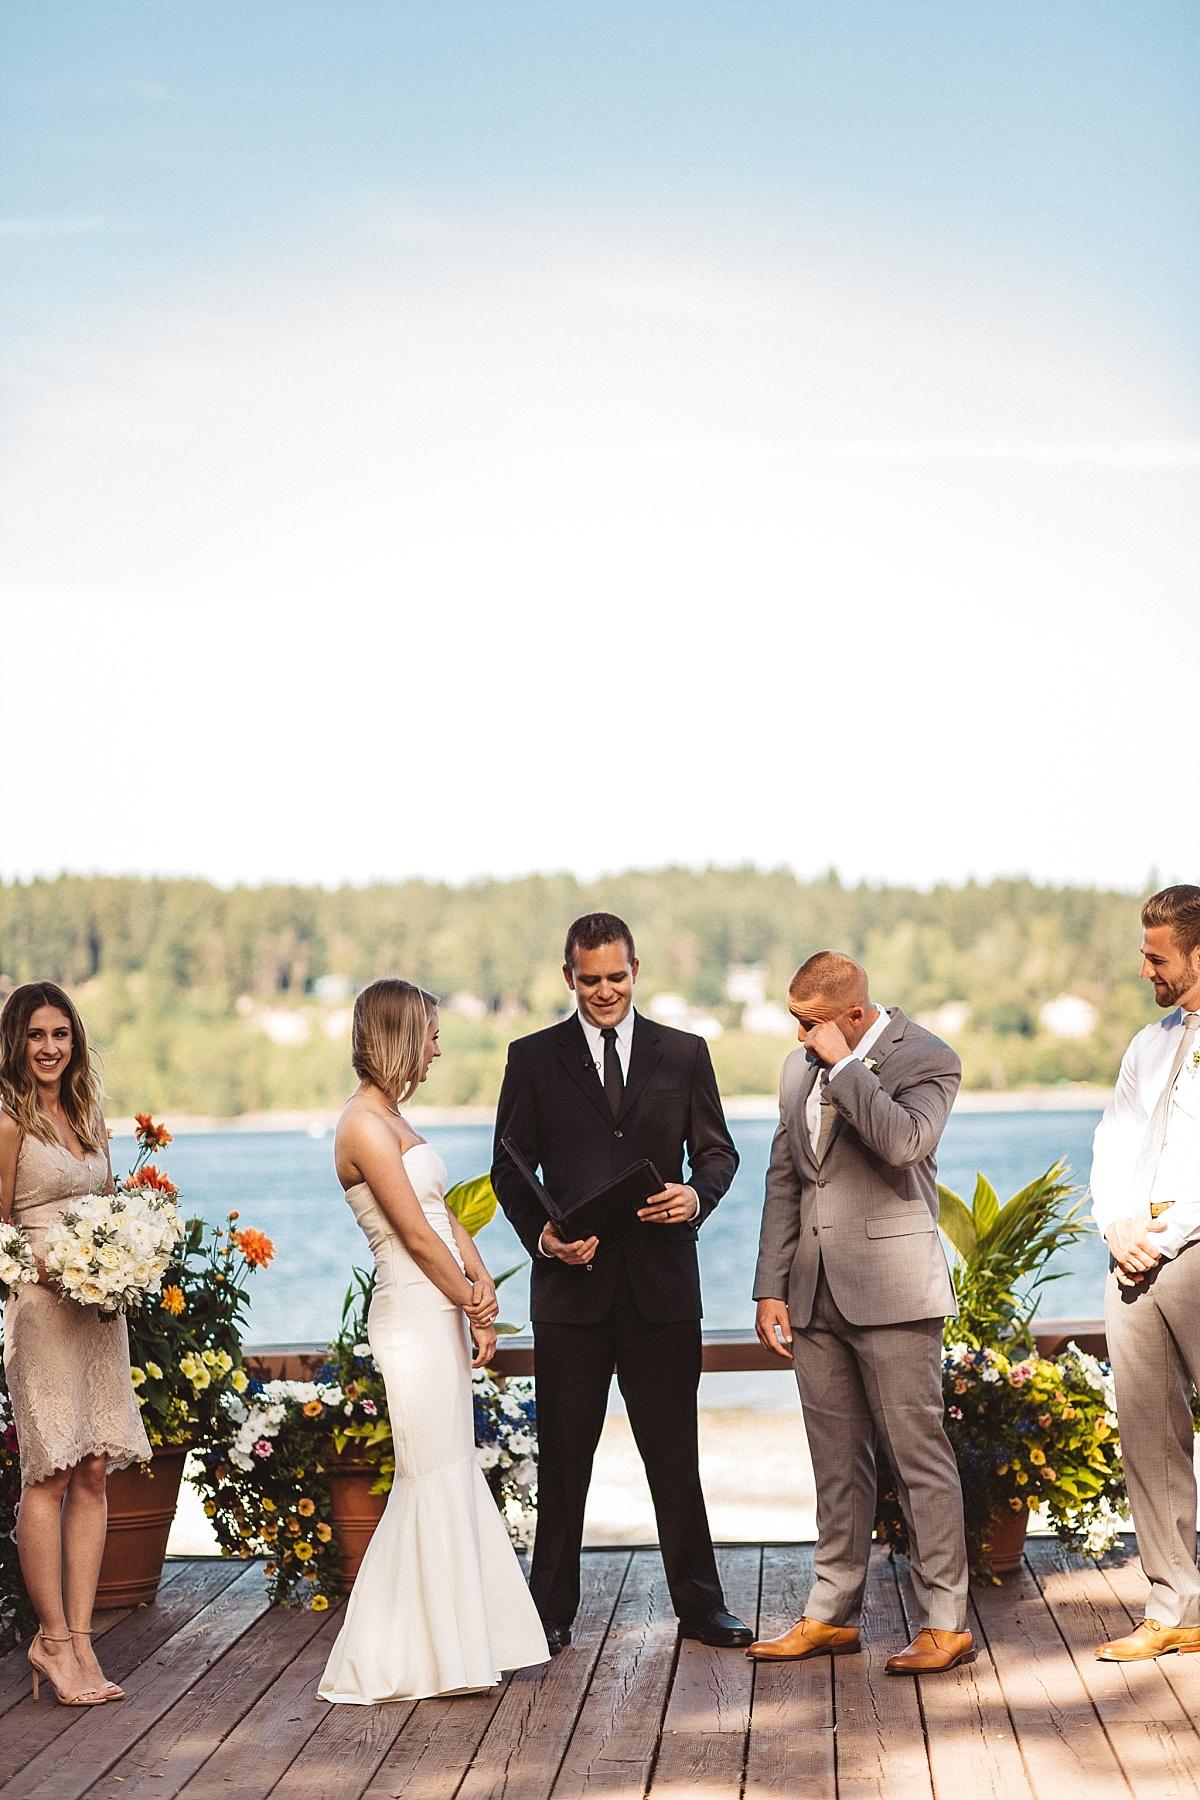 Wiseman-Faces-Photography-Wedding-0051.JPG